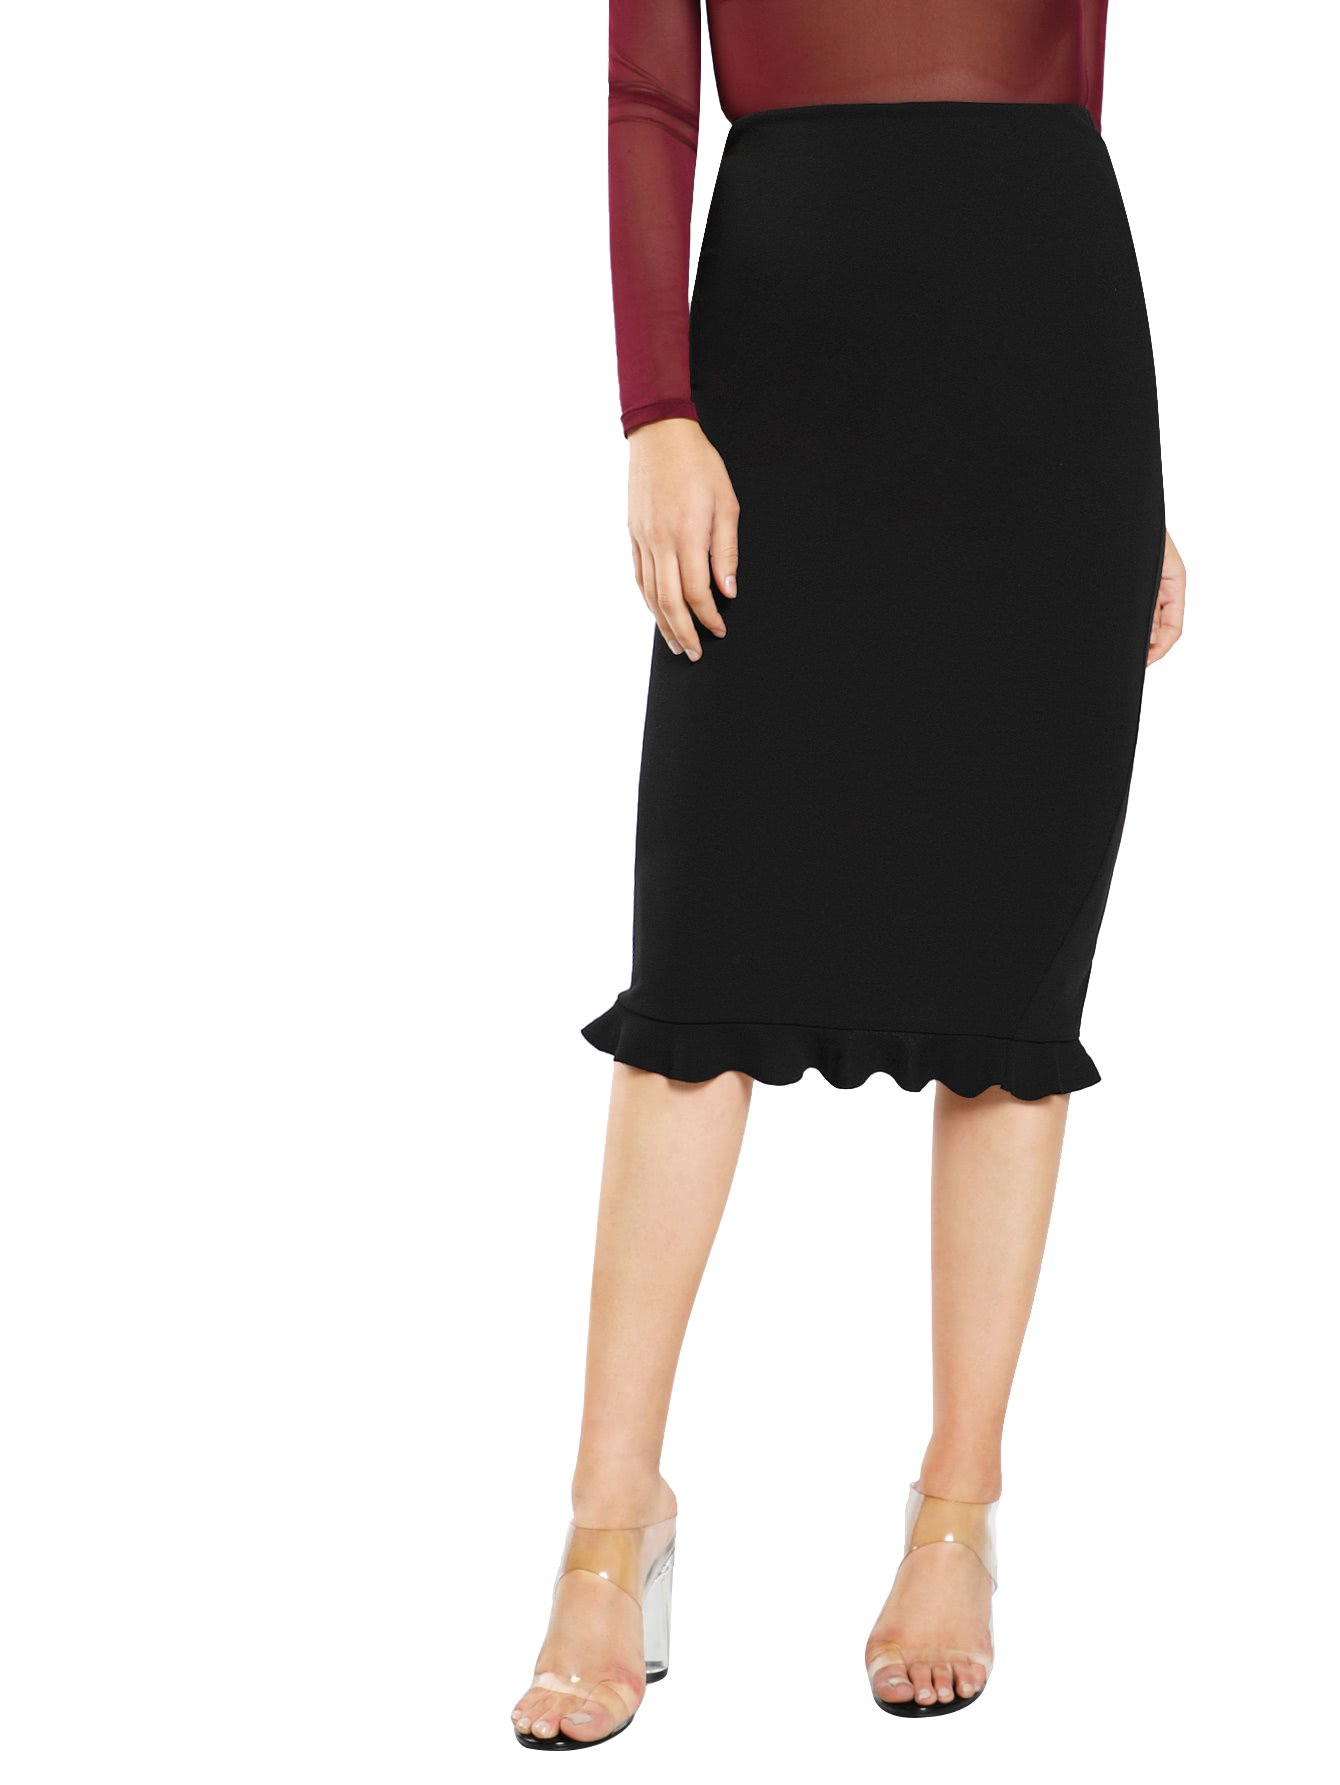 MakeMeChic Women's Polka Dot Ruffle Fishtail Wear To Work Midi Pencil Skirt Black-1 L